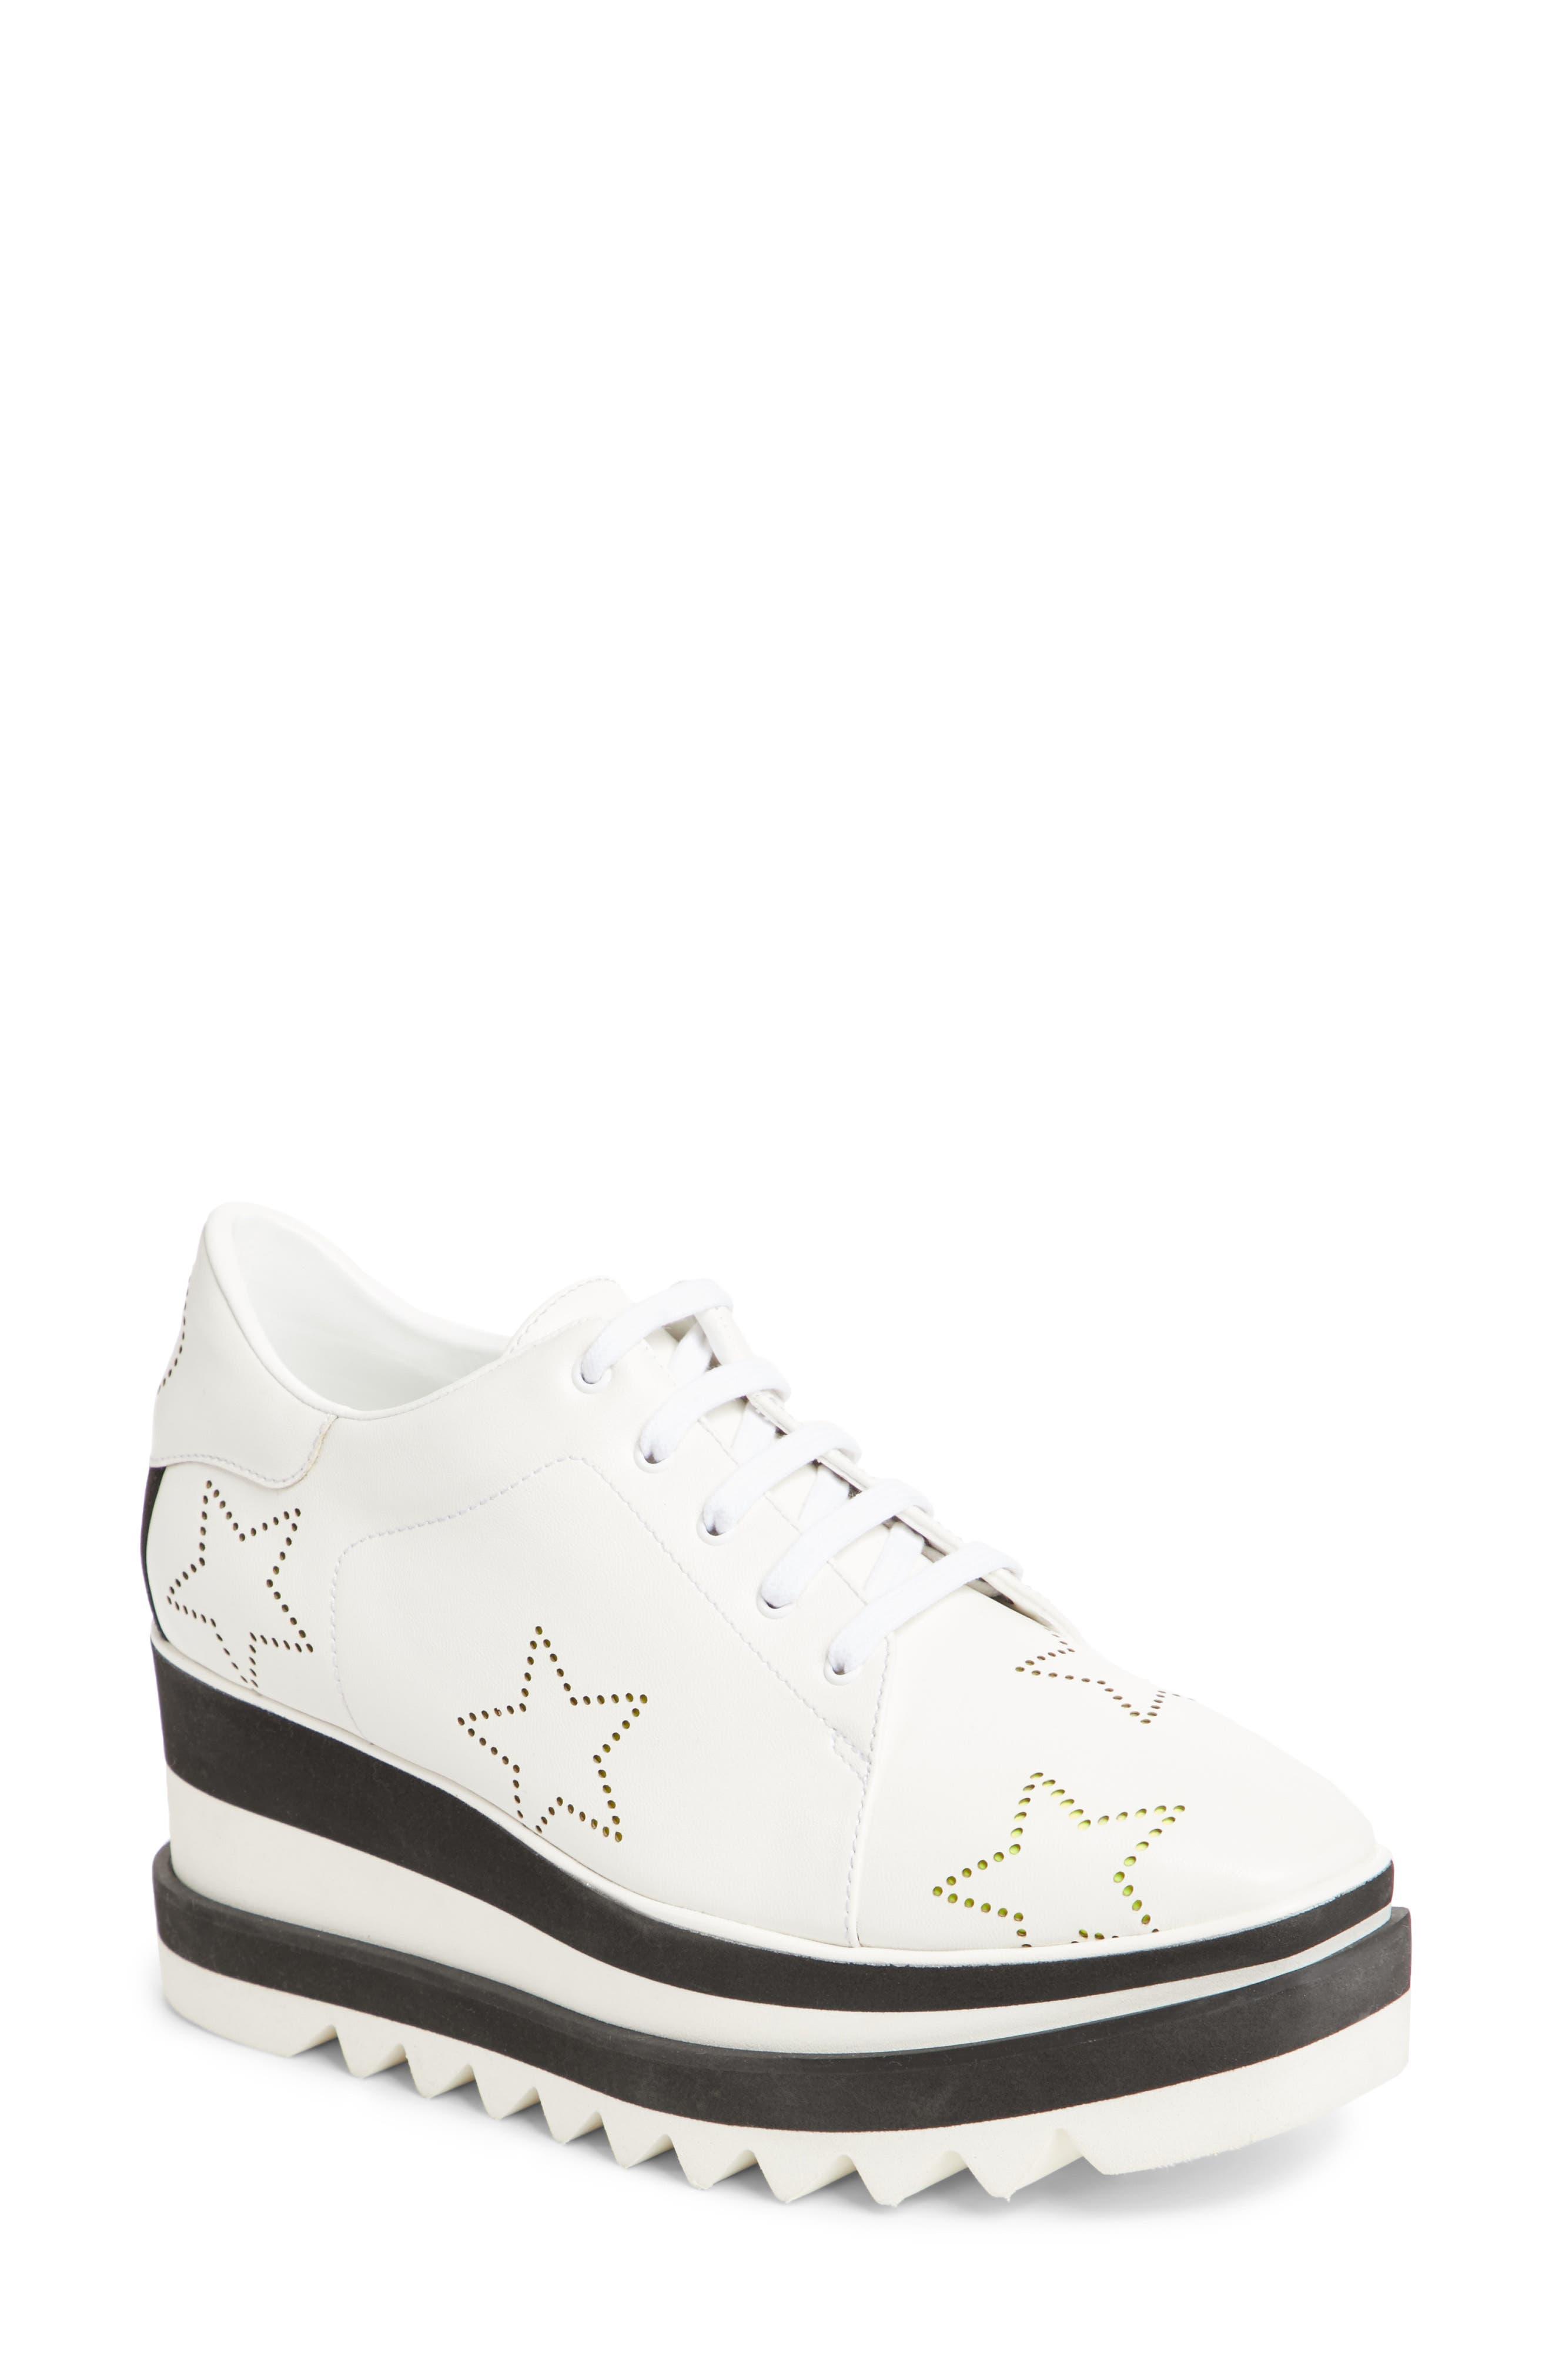 Elyse Platform Sneaker,                             Main thumbnail 1, color,                             White